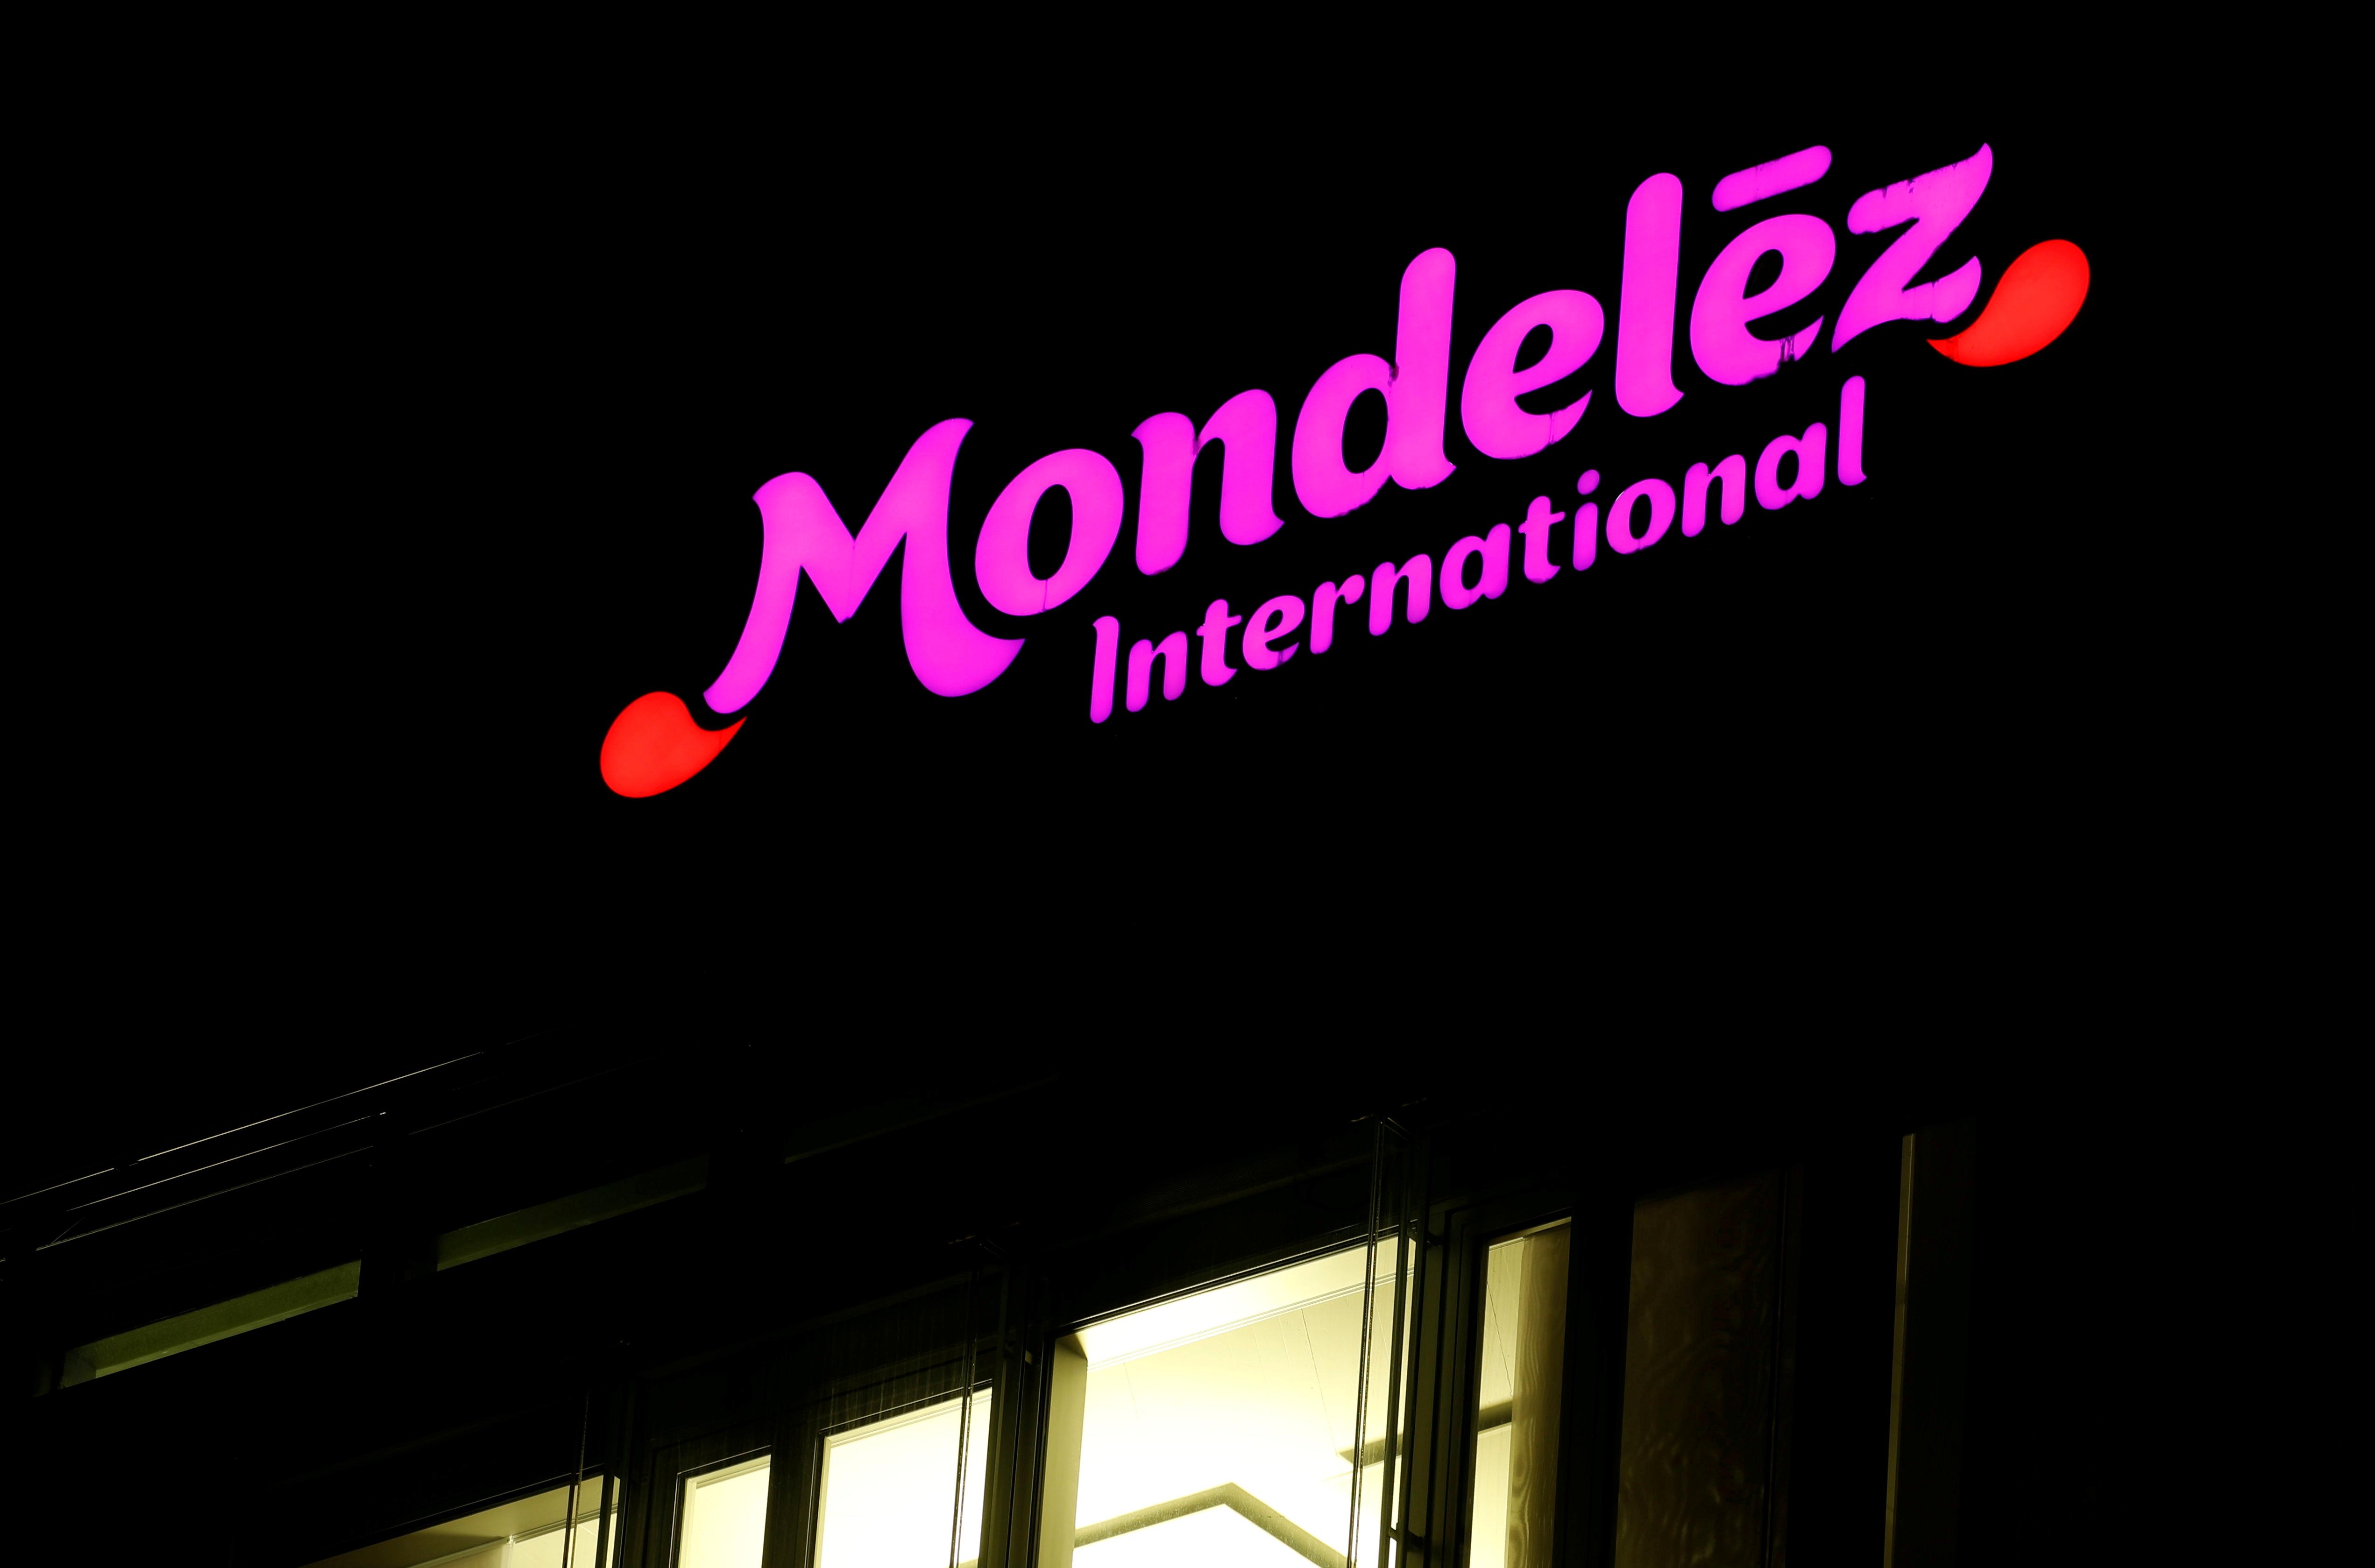 The logo of Mondelez International is seen on an office building in the Glattpark district in Opfikon, Switzerland October 2, 2018.  REUTERS/Arnd Wiegmann